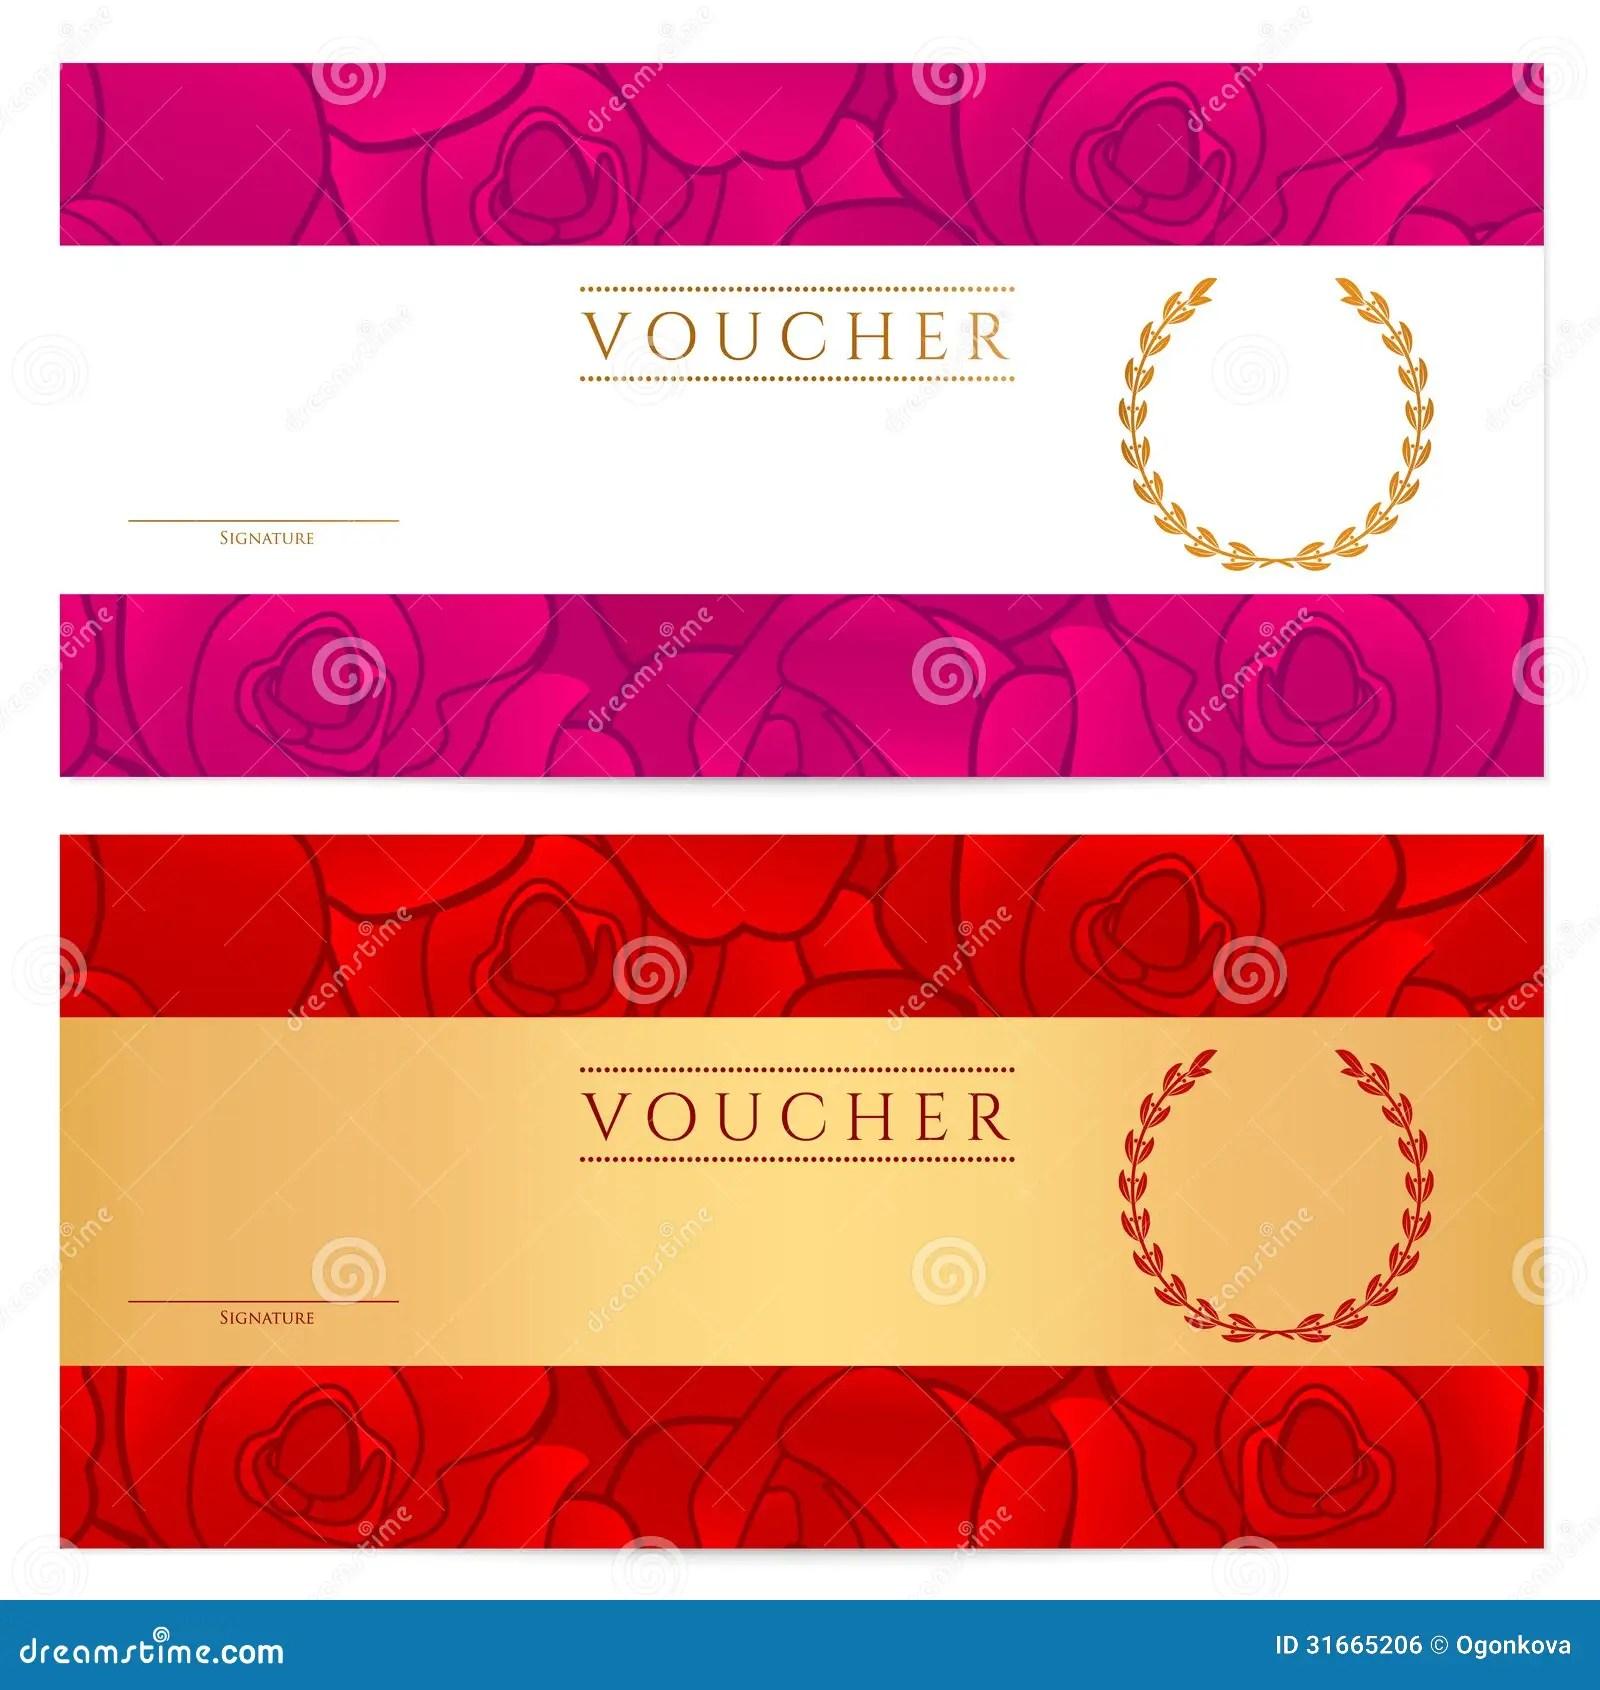 Voucher Template Free invoice template receipt template – Create a Voucher